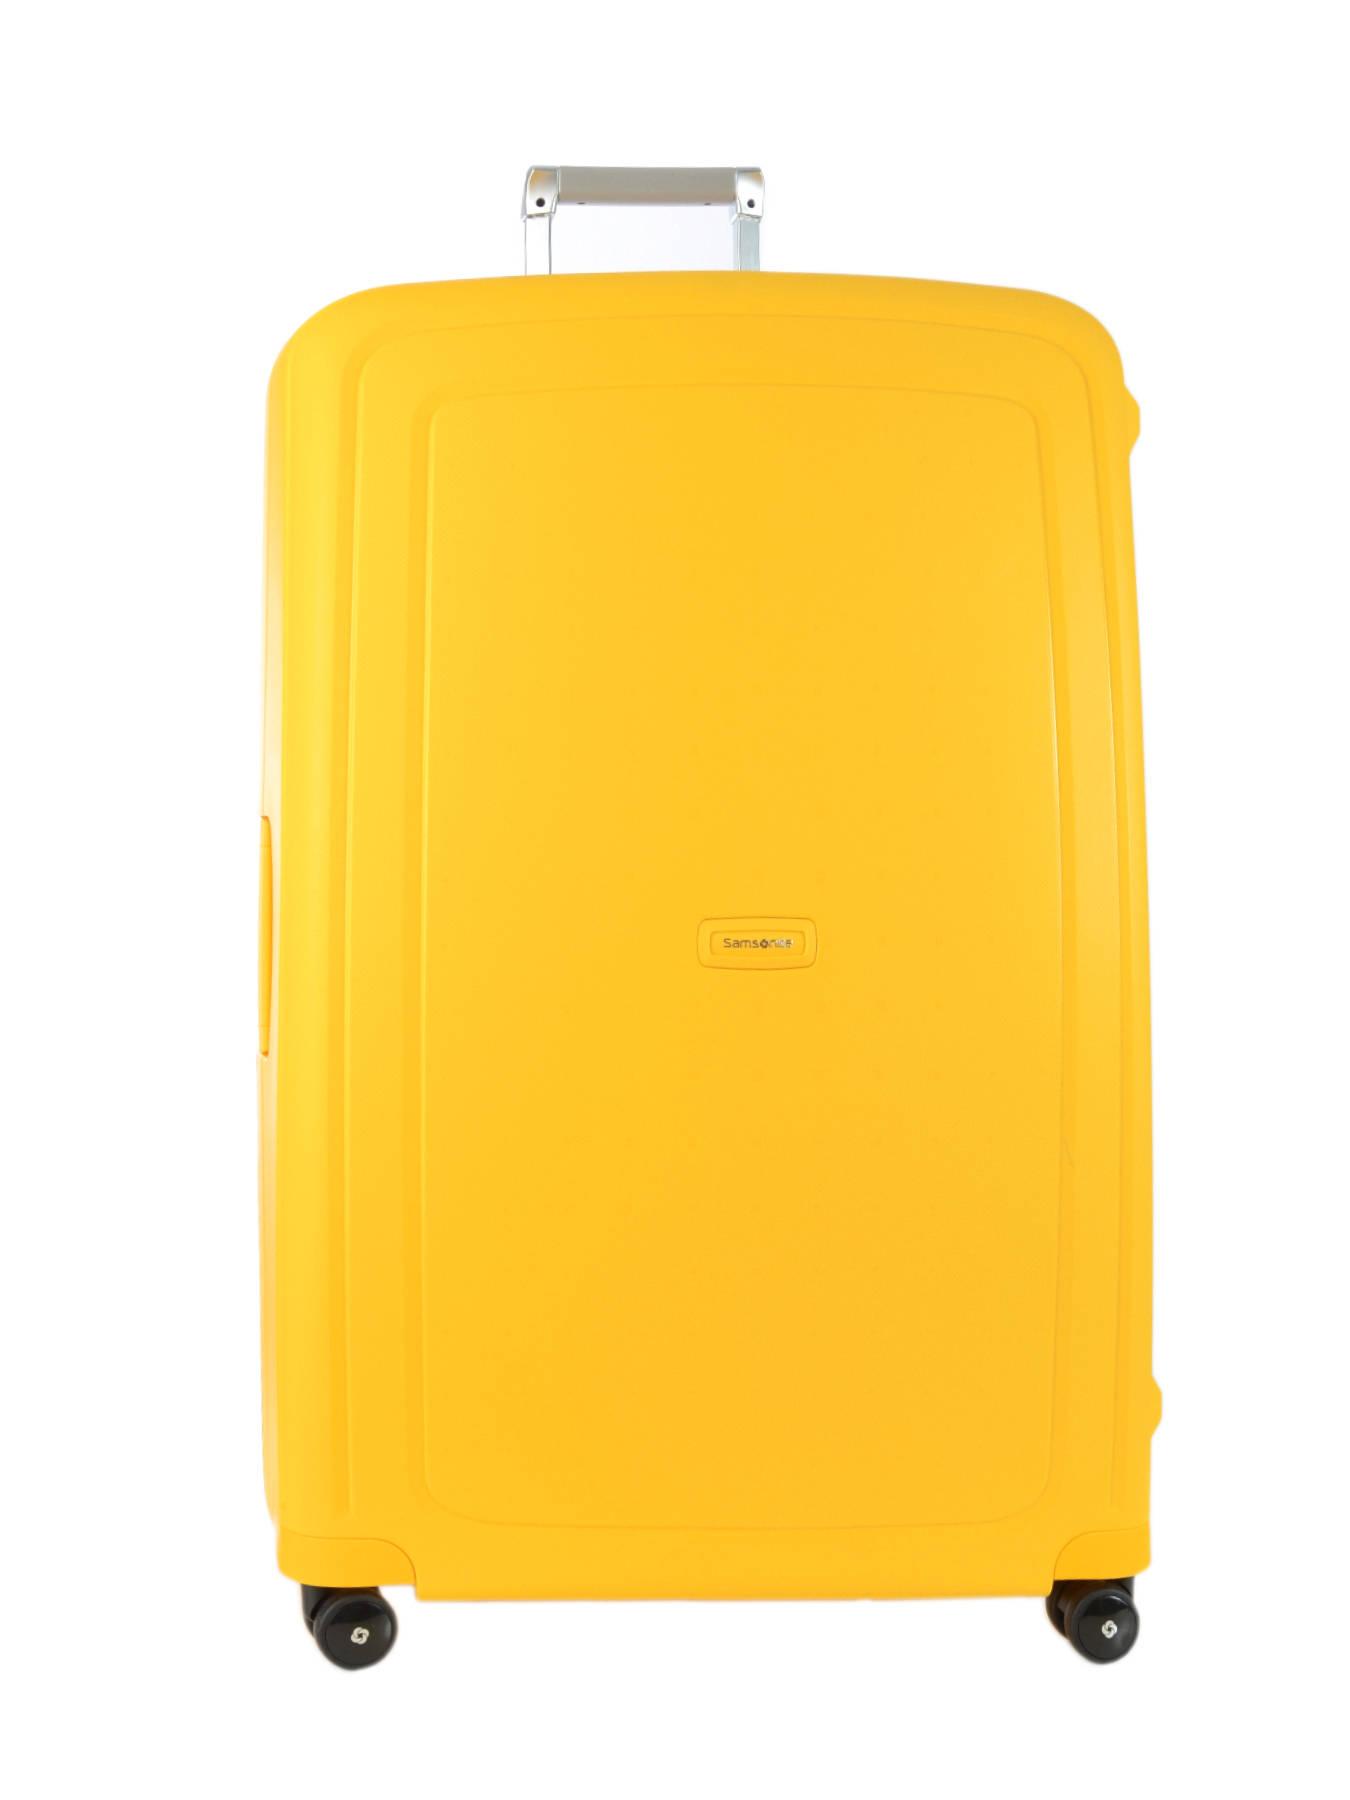 valise rigide samsonite s 39 cure yellow en vente au meilleur prix. Black Bedroom Furniture Sets. Home Design Ideas